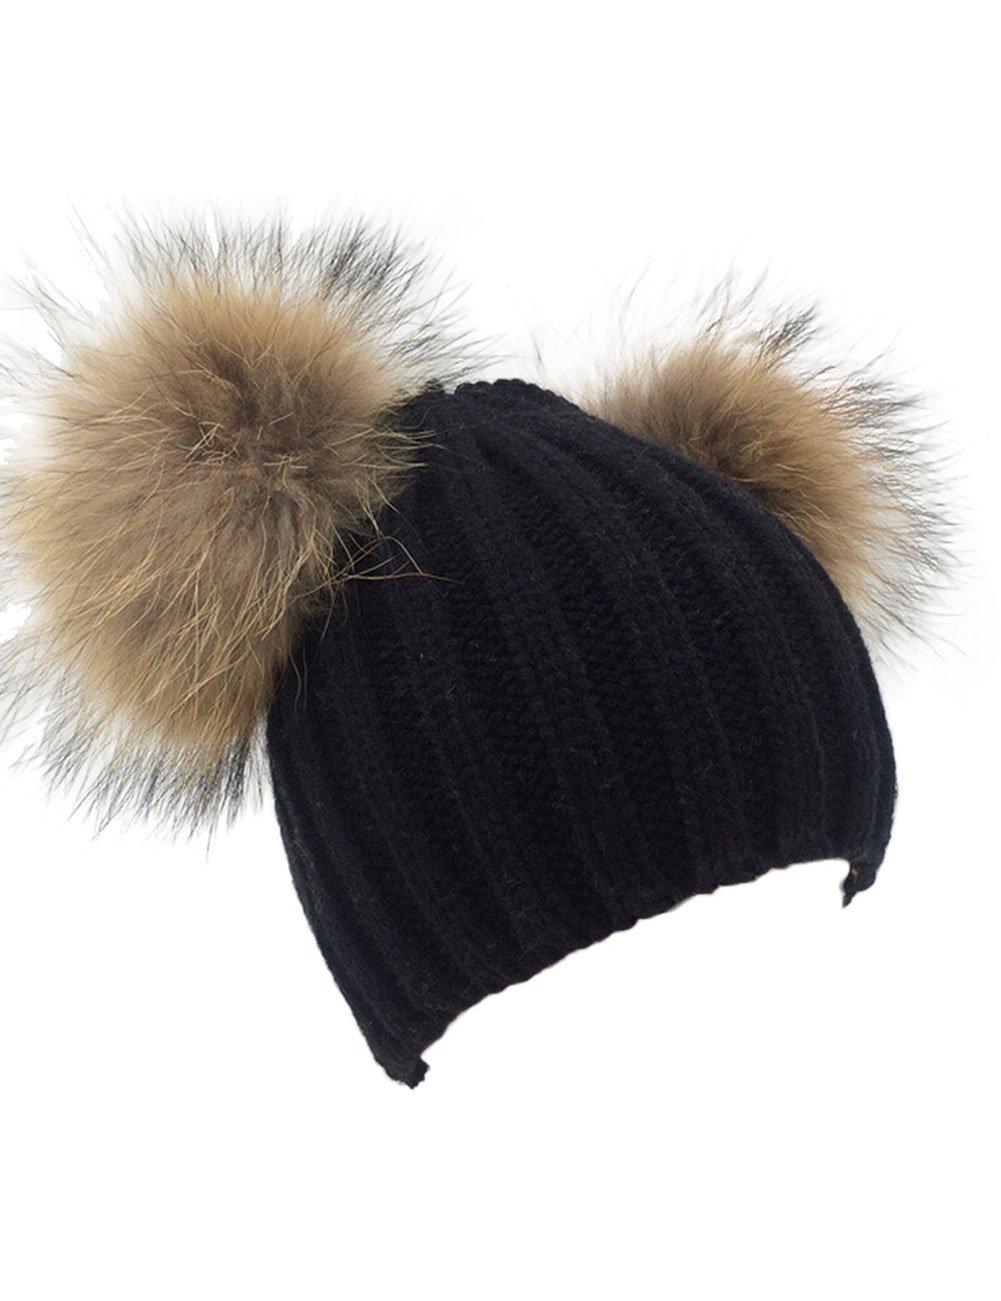 XWDA Women's Knitted Raccoon Fur Double Pom Beanie Hat (Black)